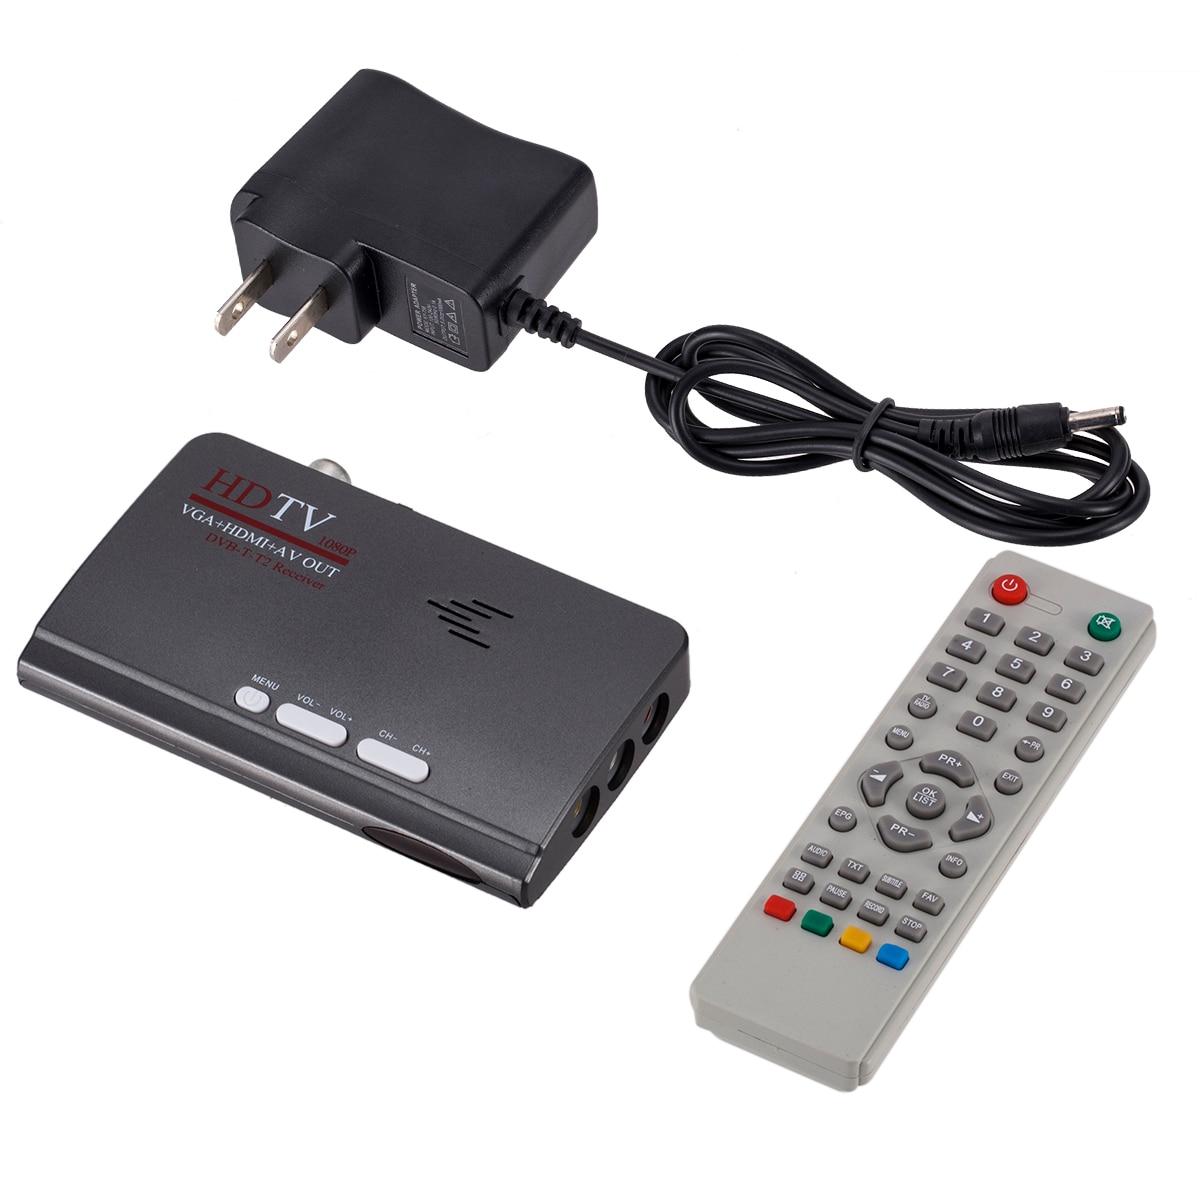 DVB-T DVB-T2 receptor/sintonizador de TV DVB T/T2 TV Box VGA AV CVBS 1080P HDMI digital receptor de satélite HD con Control remoto